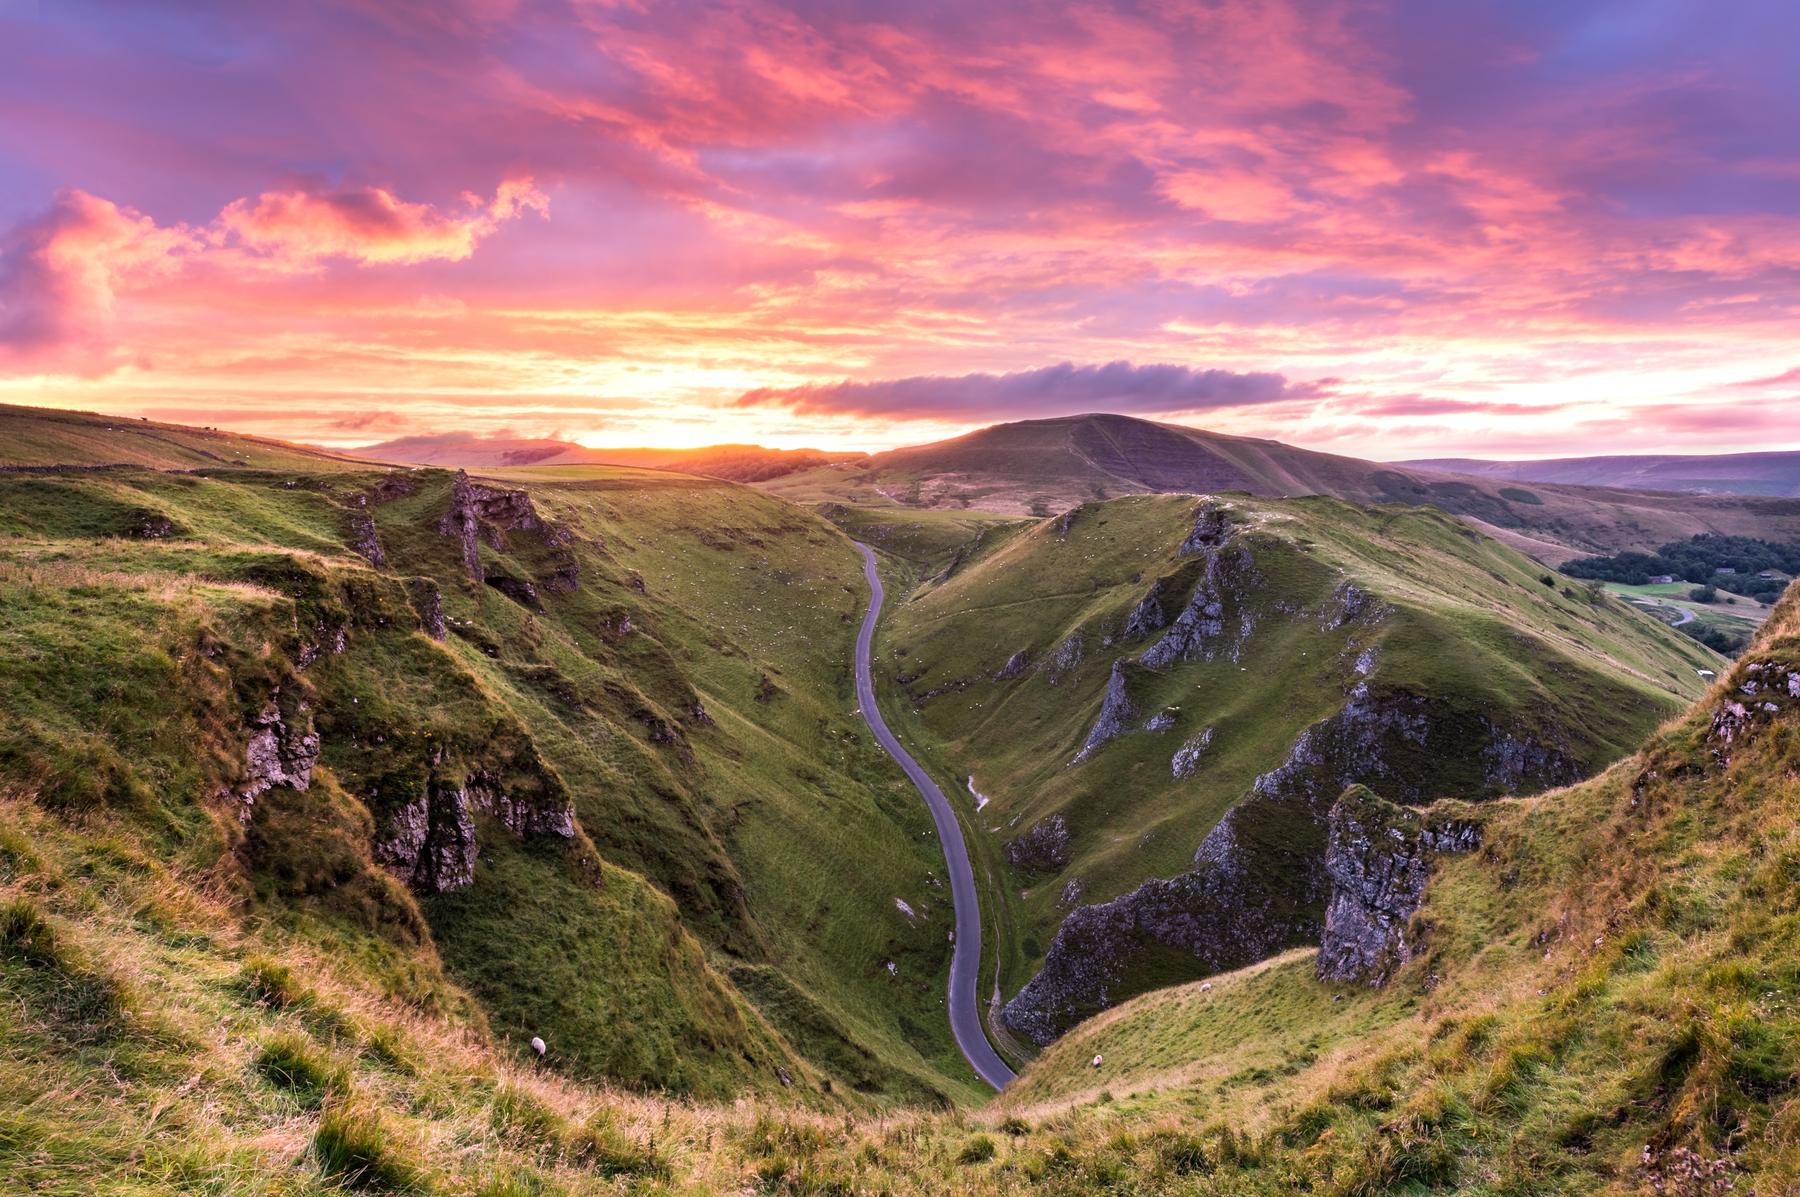 Sunset over Winnats Pass in the Peak District